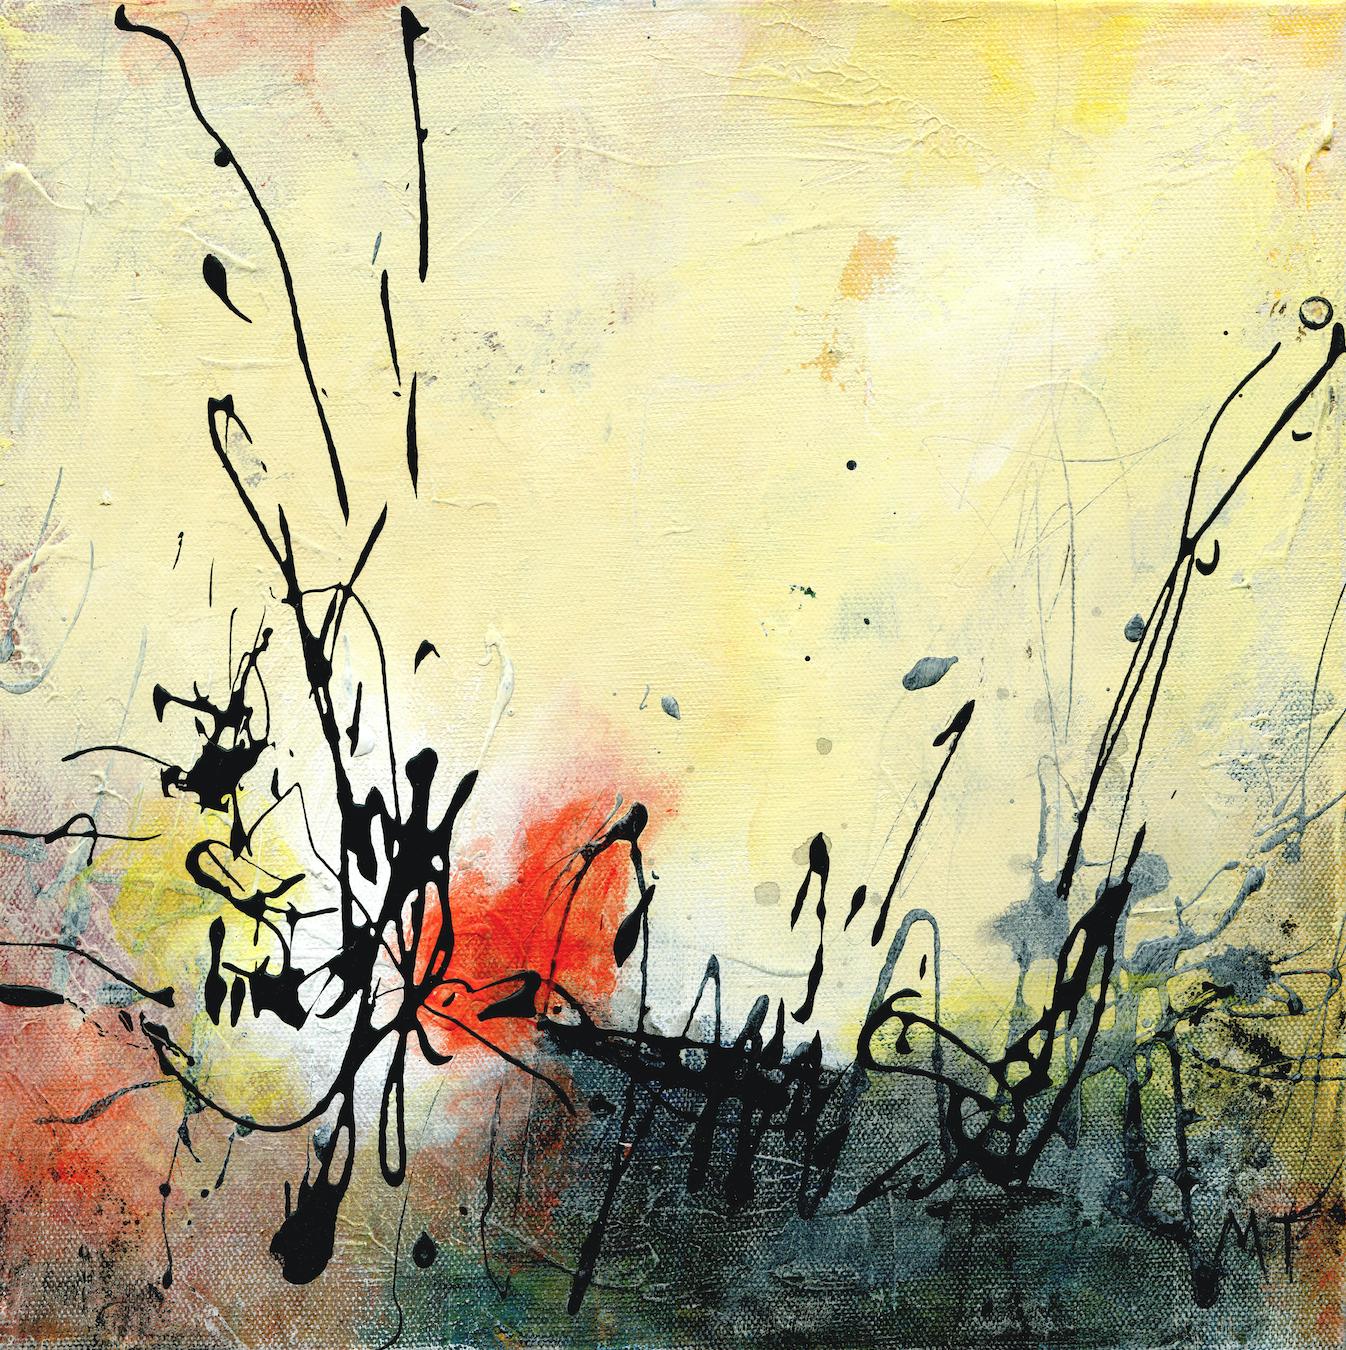 Yellow_messy_abstract_art_mandy_thompson.jpg